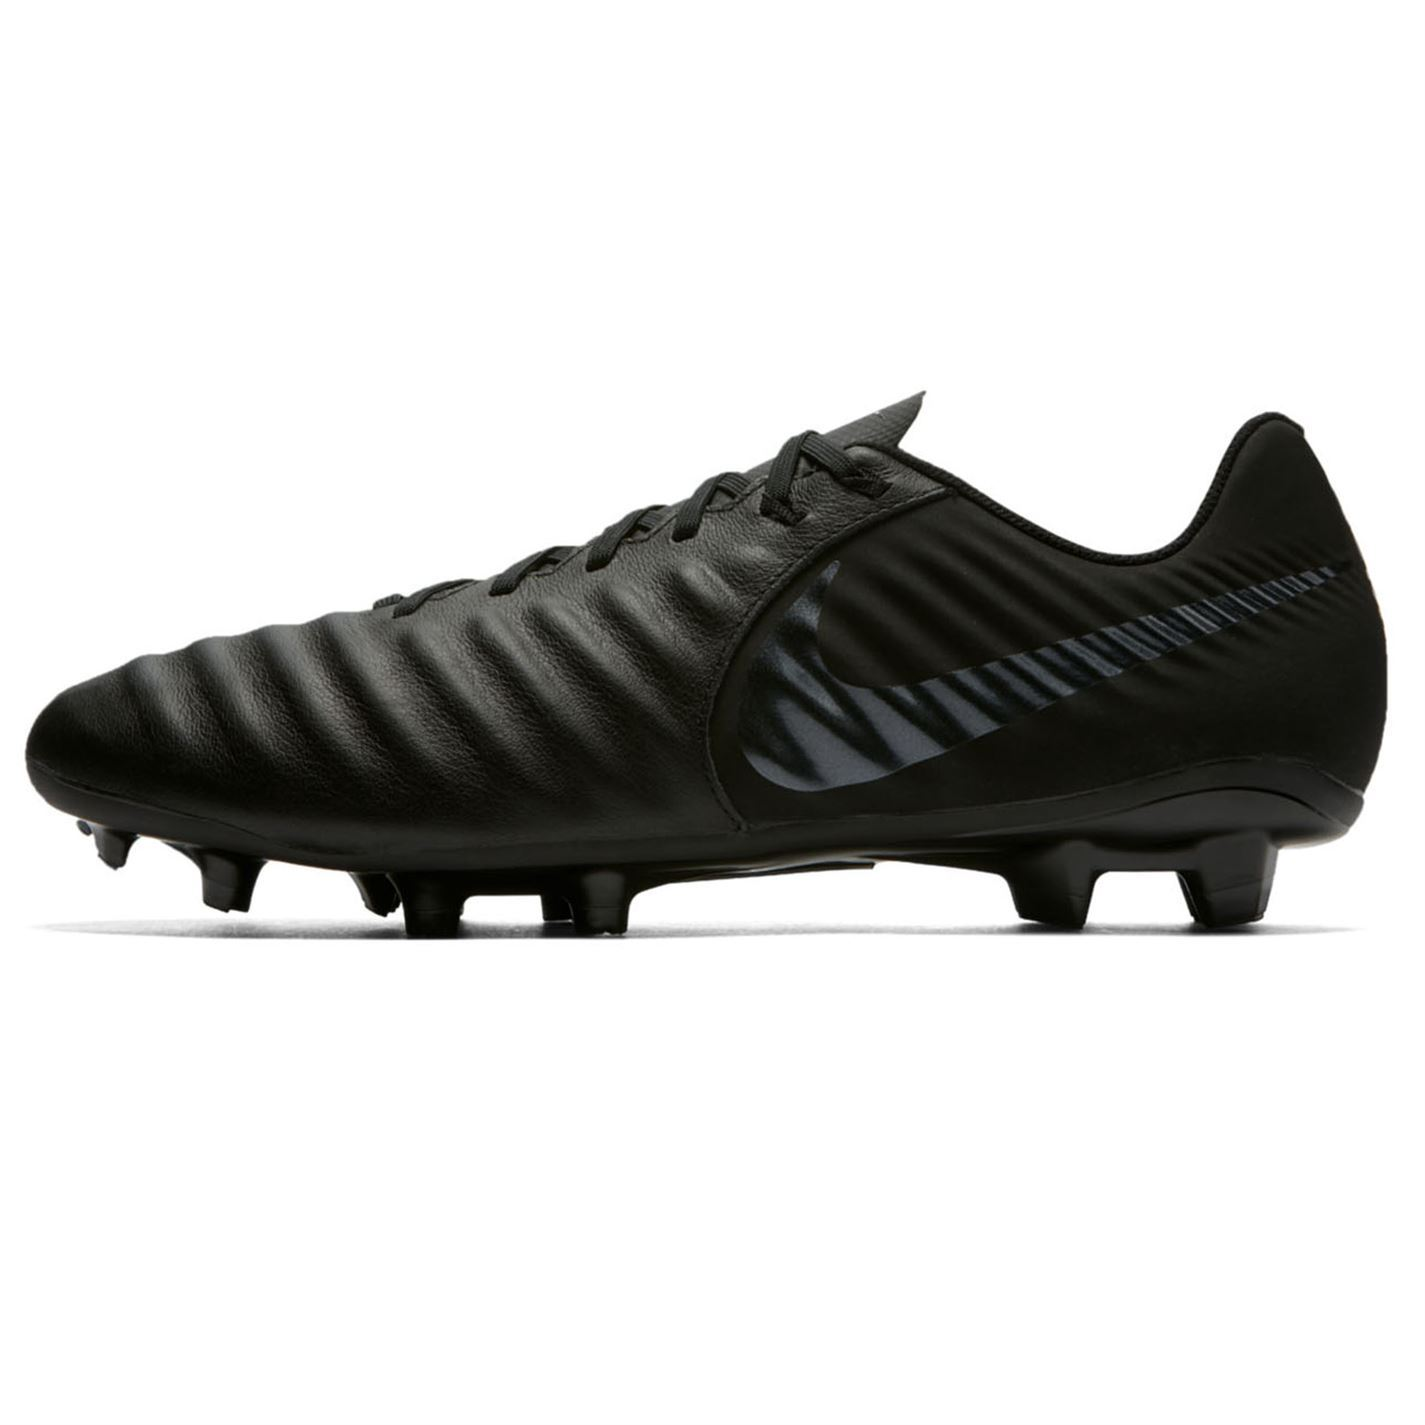 Nike-Tiempo-Legend-Academy-FG-Firm-Ground-Chaussures-De-Football-Homme-Football-Chaussures-Crampons miniature 4